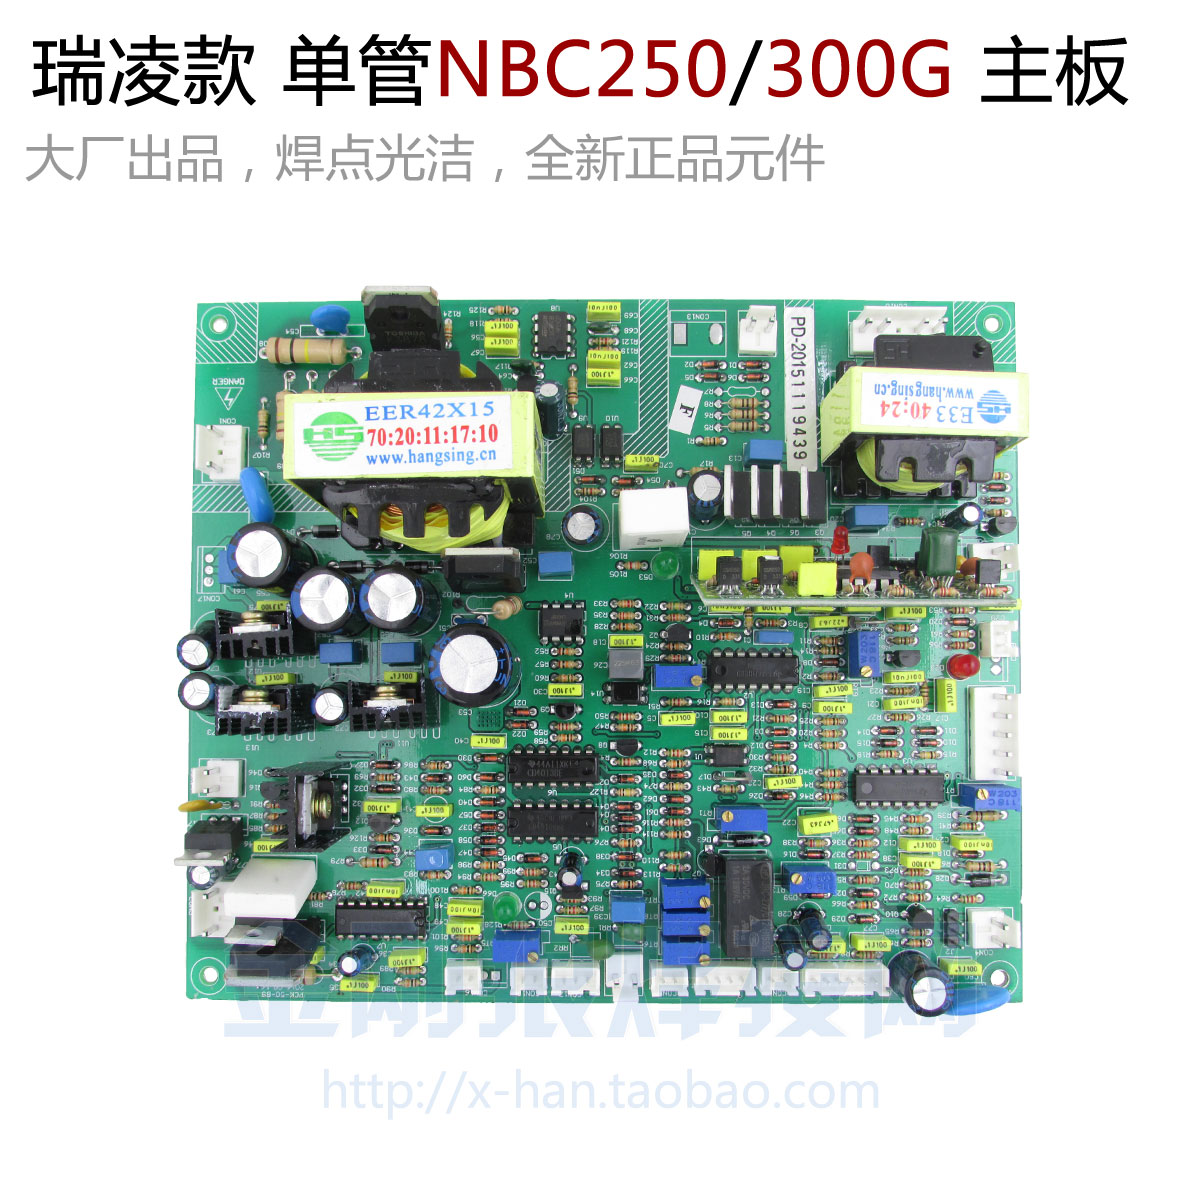 все цены на Single Pipe IGBT NBC250G 300G Carbon Dioxide Gas Shielded Welding Motherboard Circuit Board онлайн